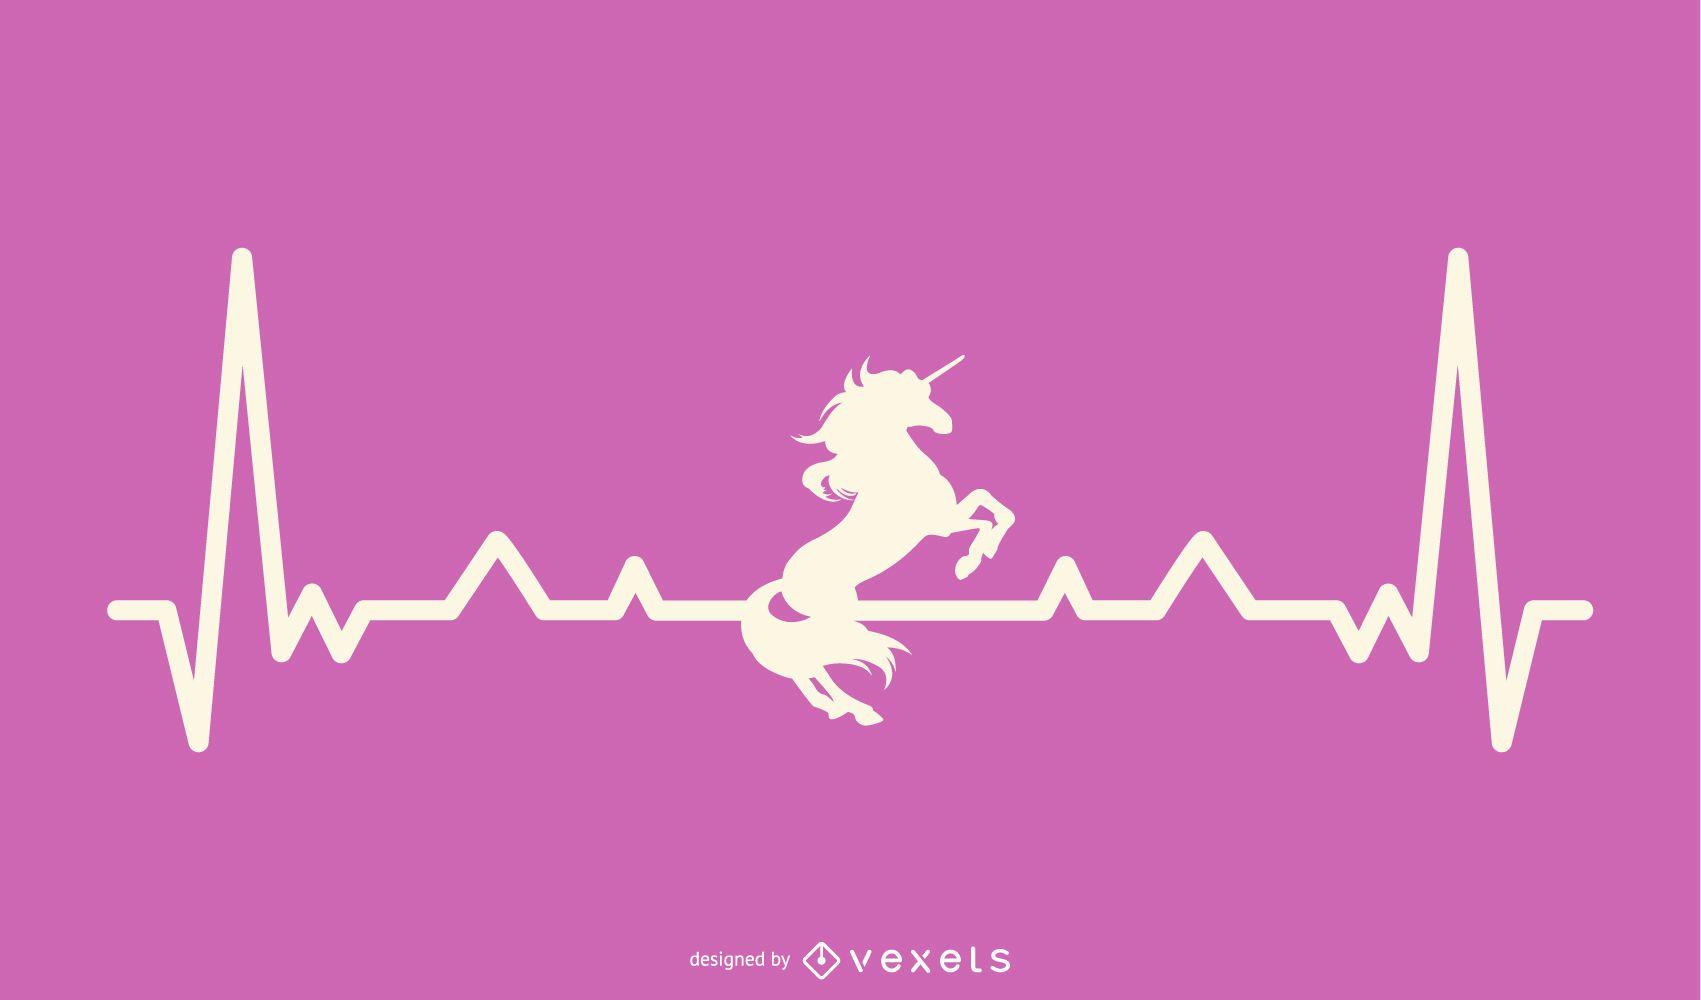 Unicorn with Heartbeat Line Illustration